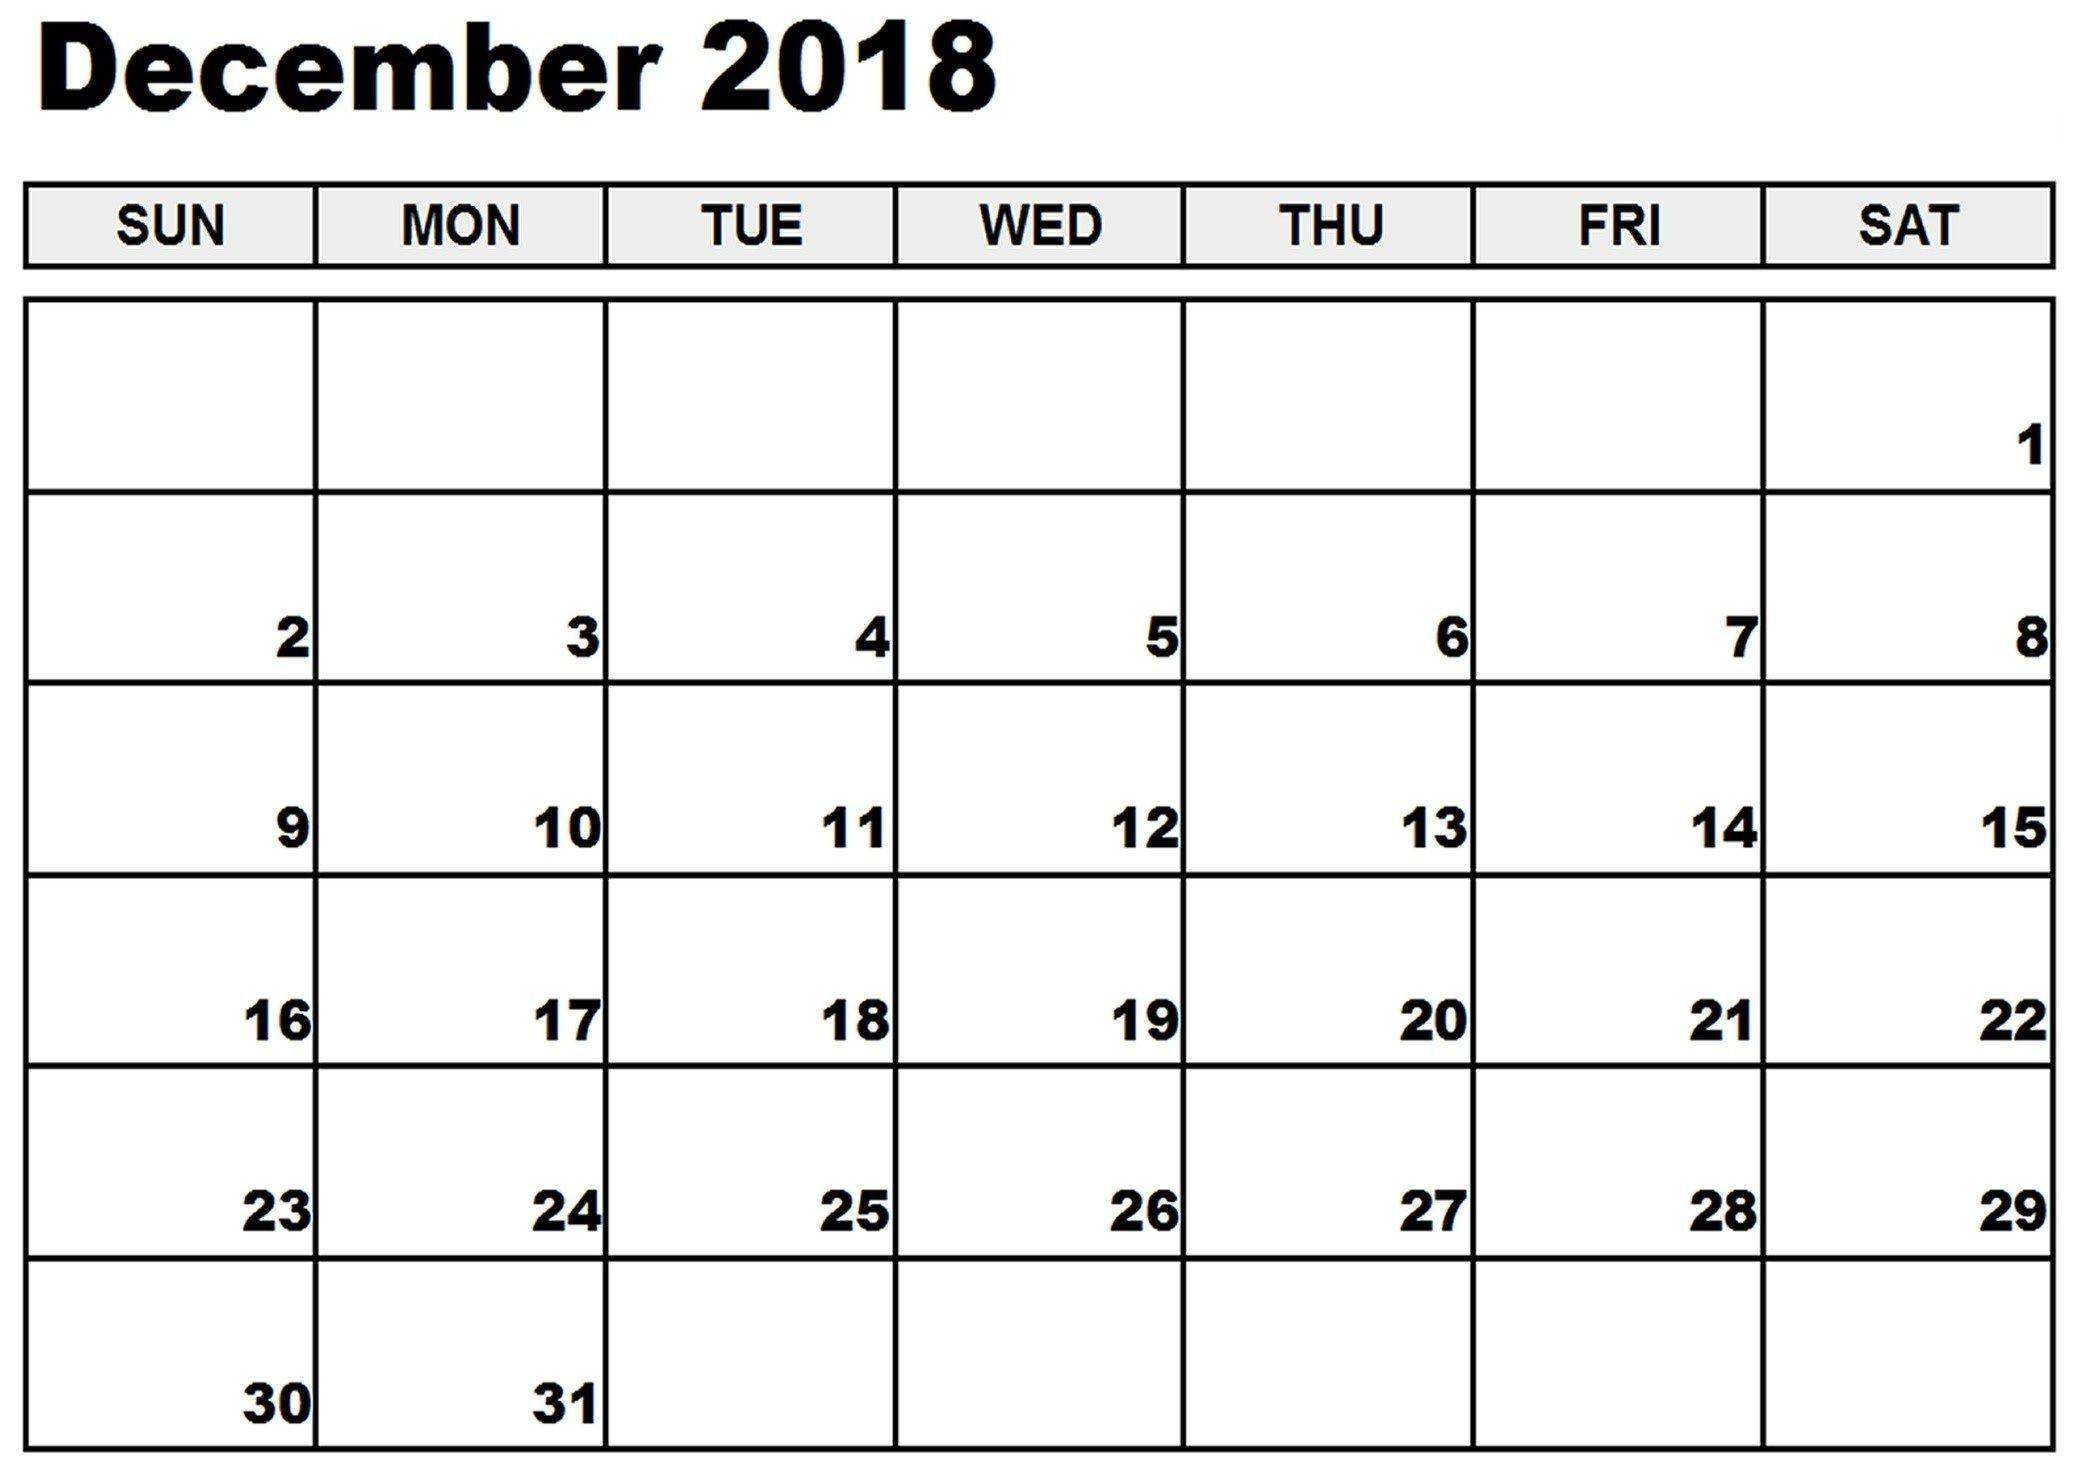 December 2018 Printable Calendar Notes To Do List Reminders-Printable Calendar Template With Notes